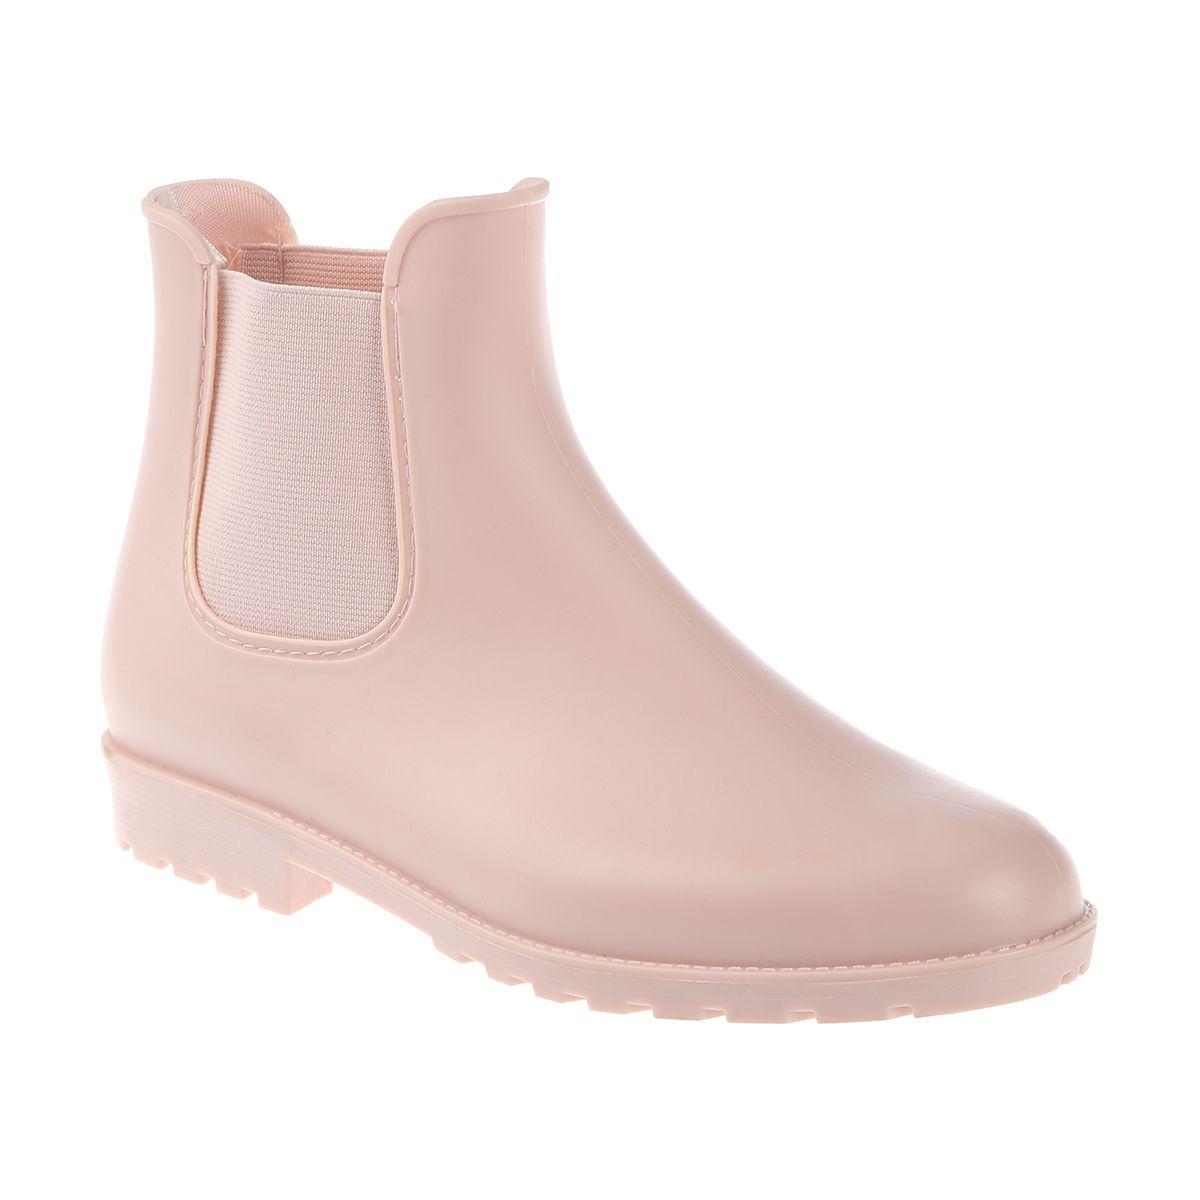 Kmart boots, Womens rain boots, Rain boots